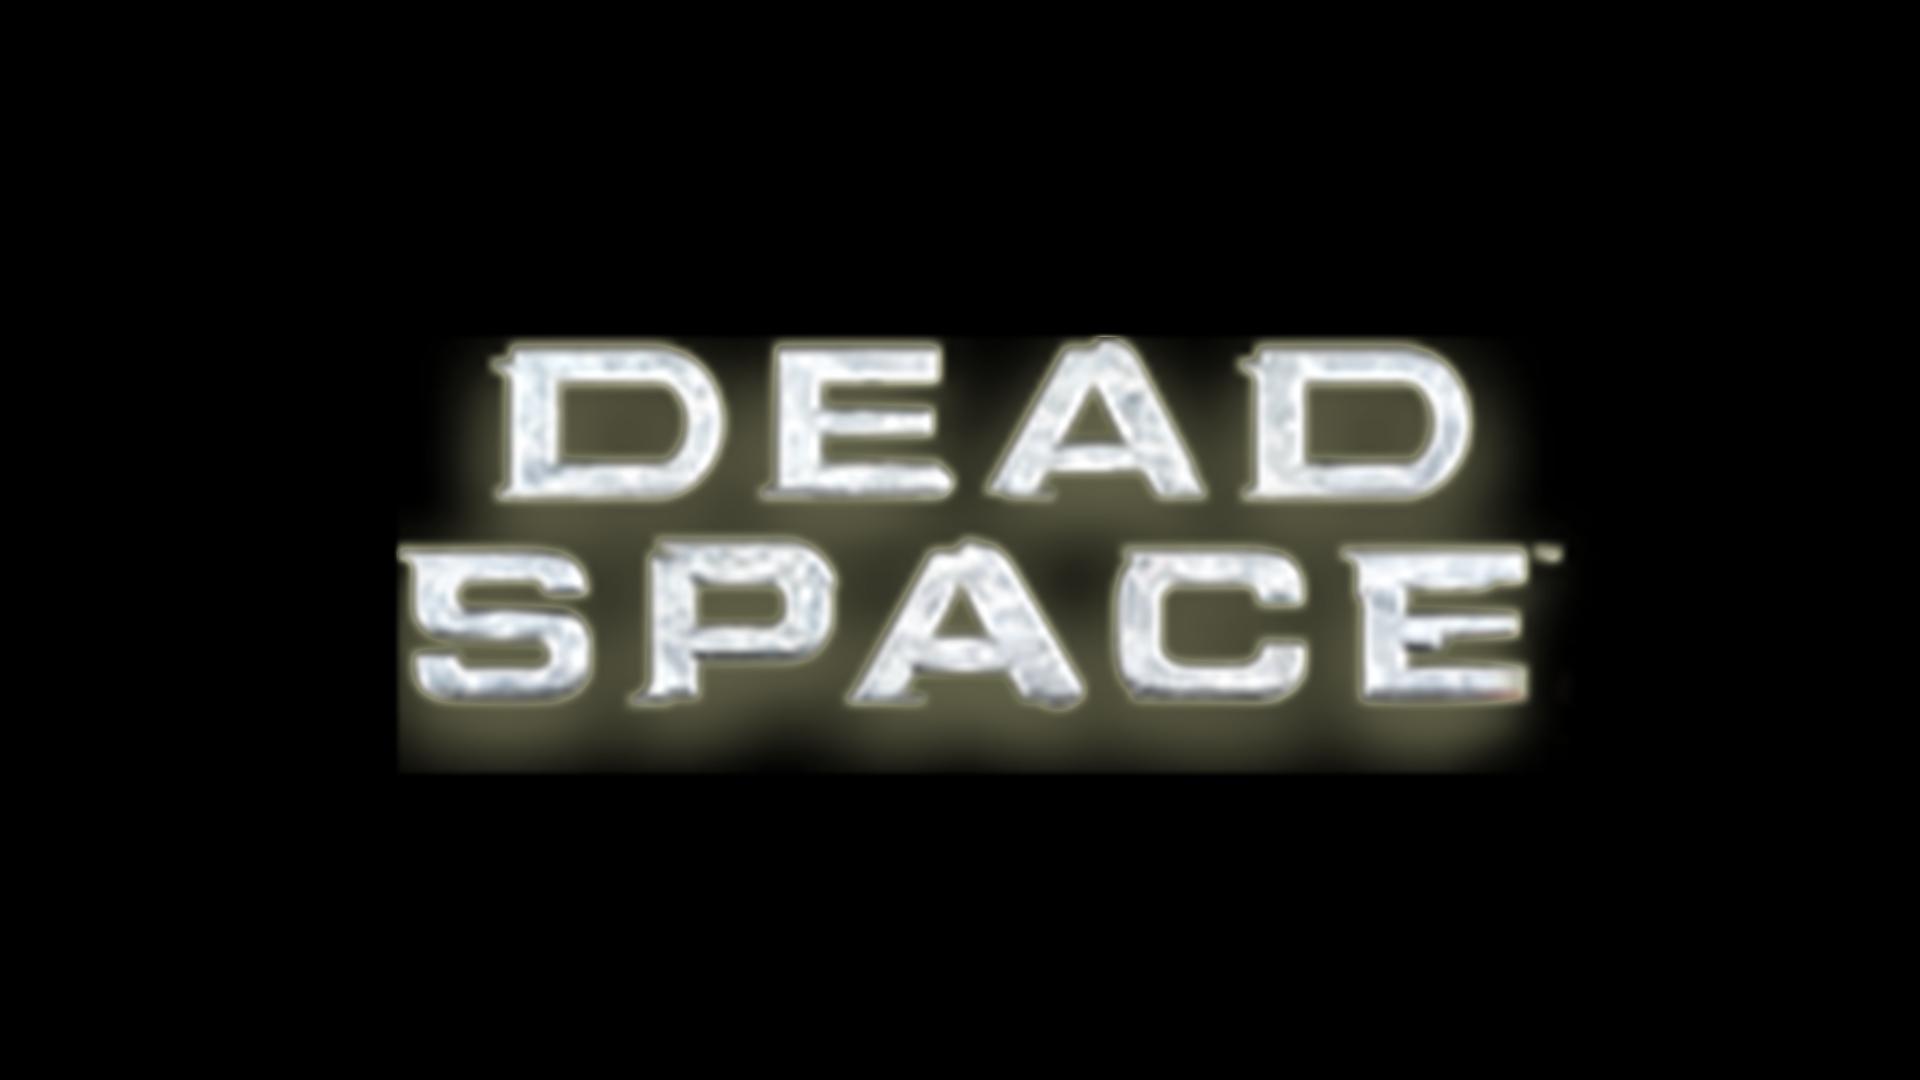 dead-space-wallpaper-yuiphone-deadspace-logo-glow-1920x1080